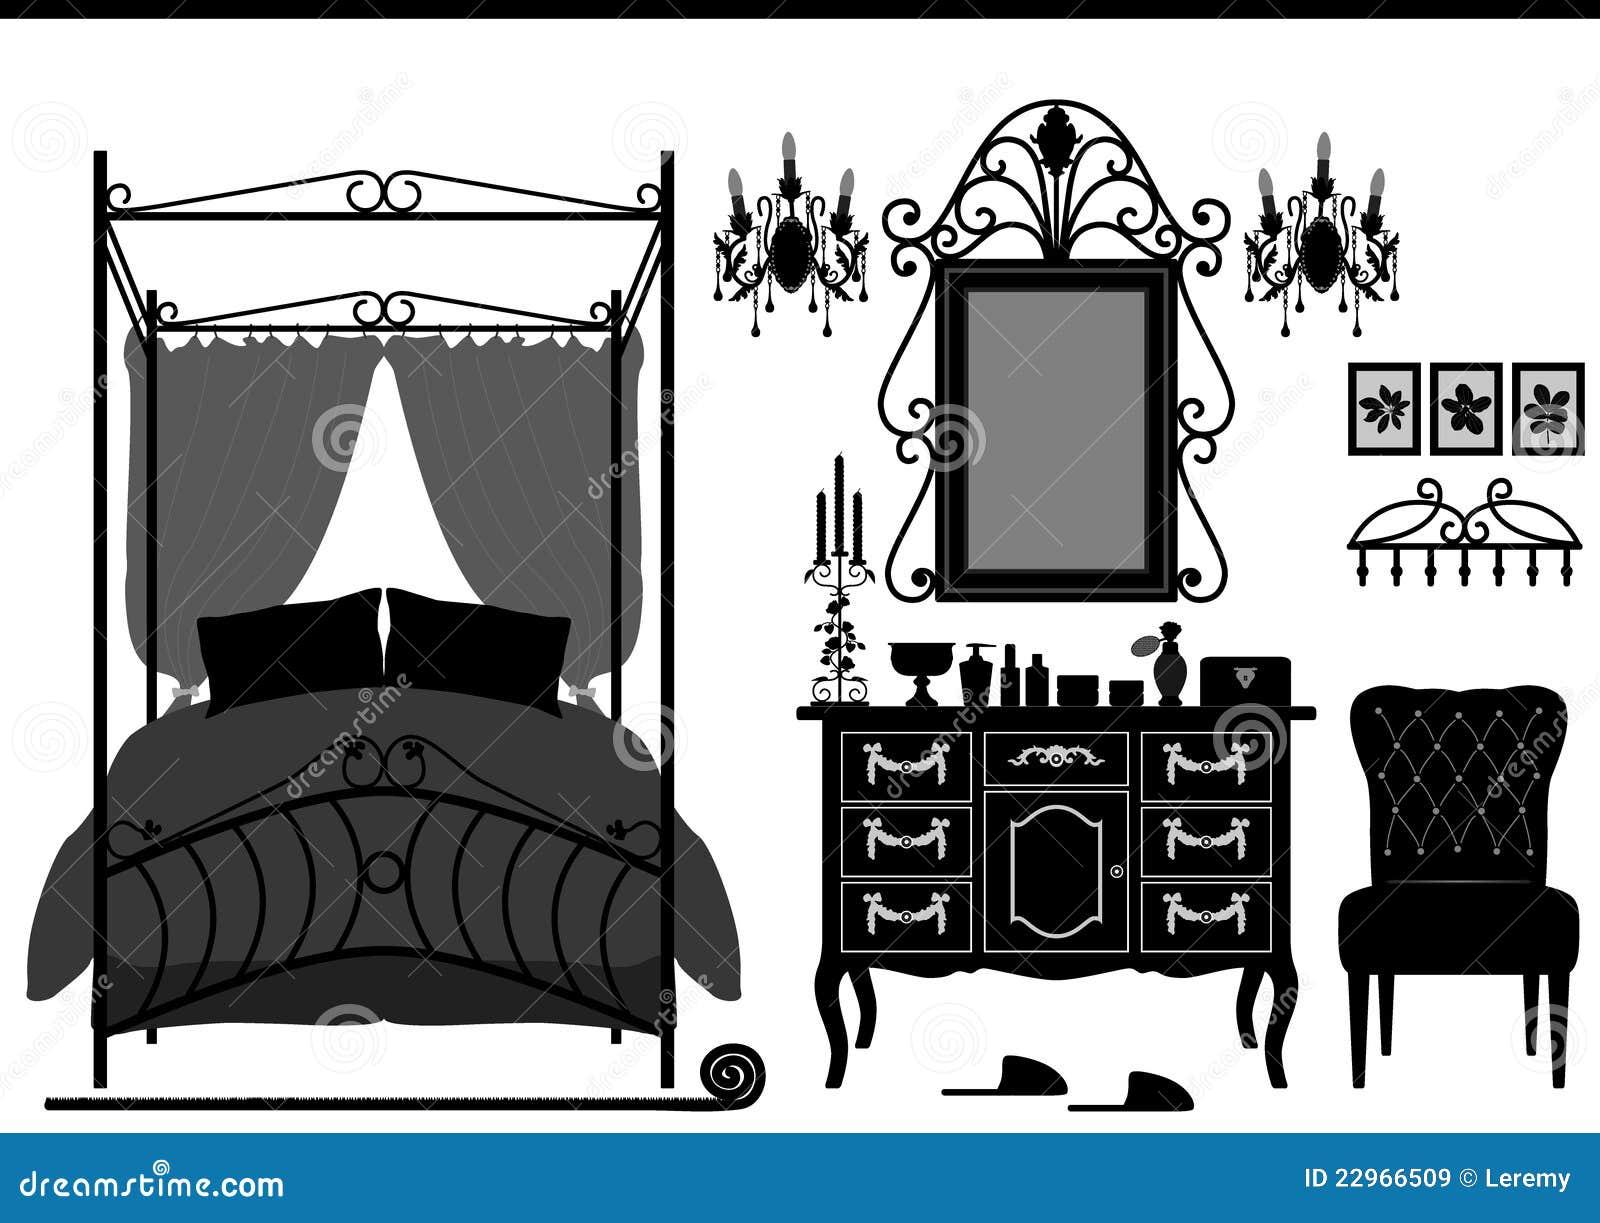 Stunning Möbel Mahler Küchenplaner Photos - Ideas & Design ...